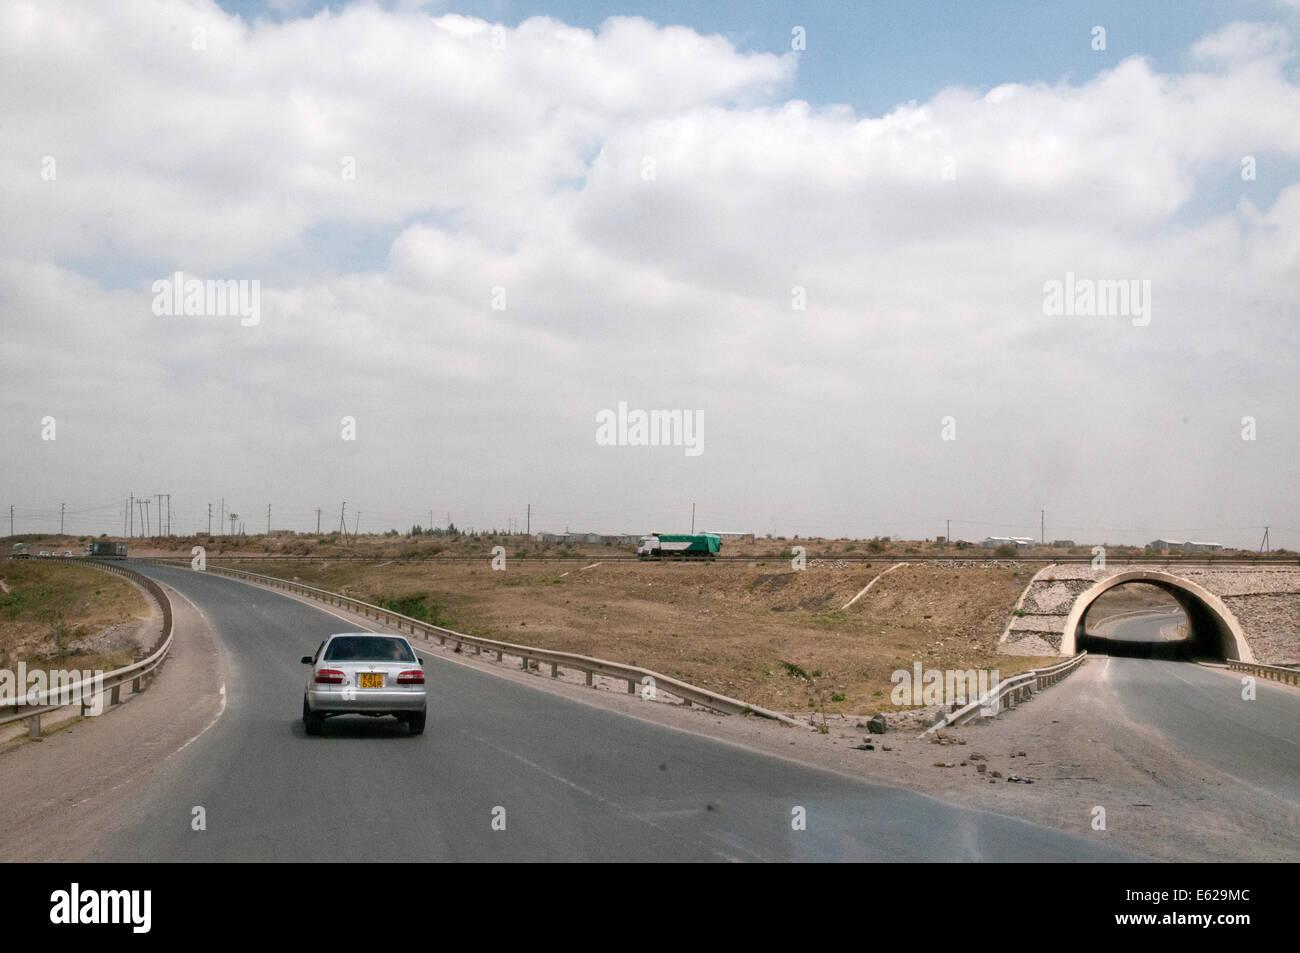 Slip road and underspass tunnel where Namanga Road joins Mombasa Nairobi highway at Athi River Kenya East Africa - Stock Image